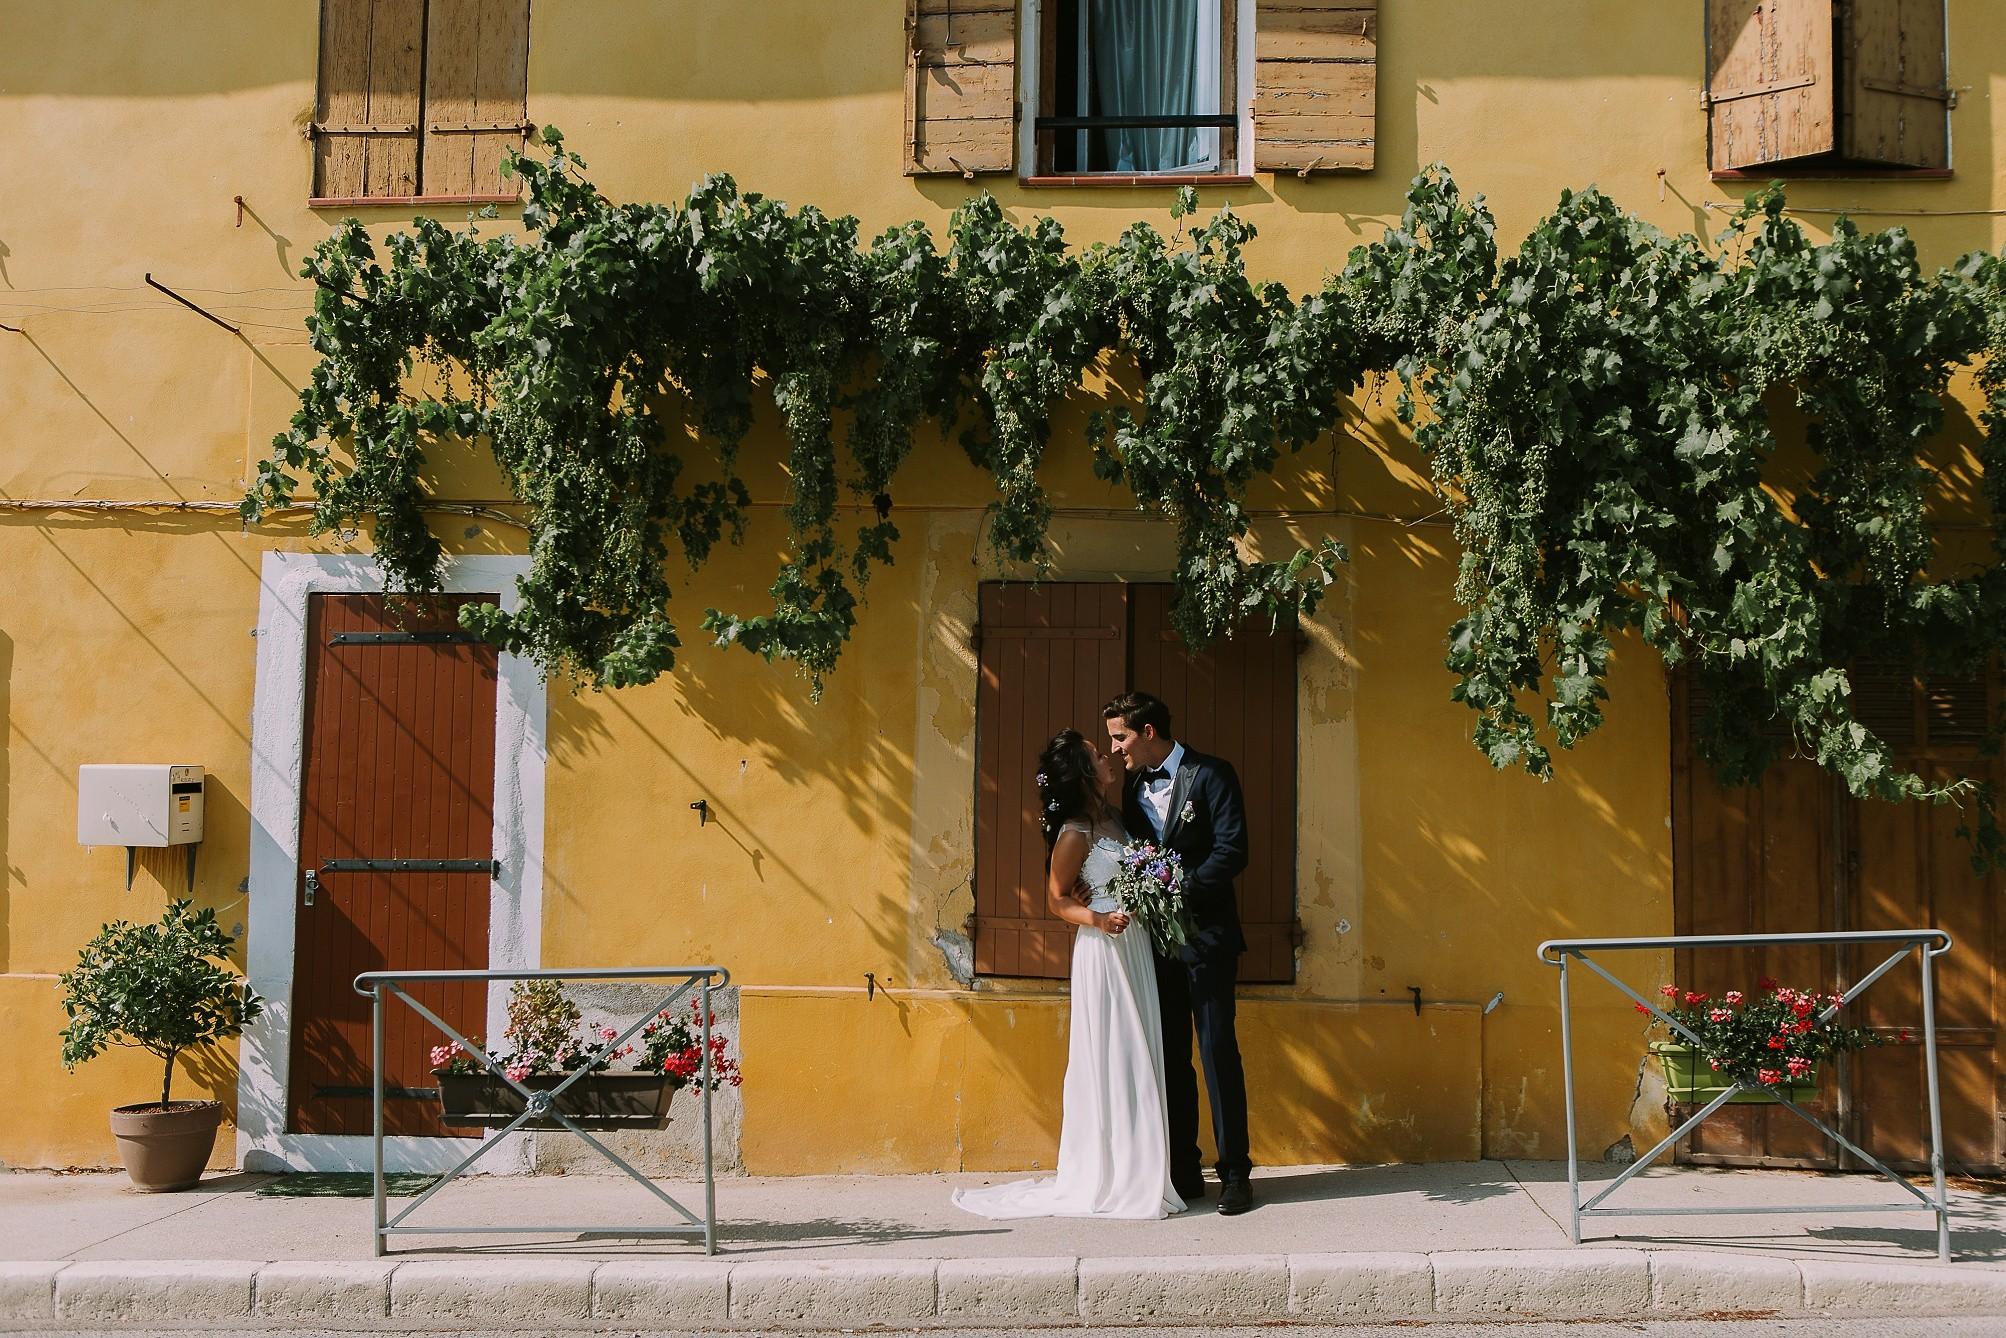 katerynaphotos-mariage-photographe-puyloubier-provence-aix-en-provence-sud-de-la-france_0381.jpg